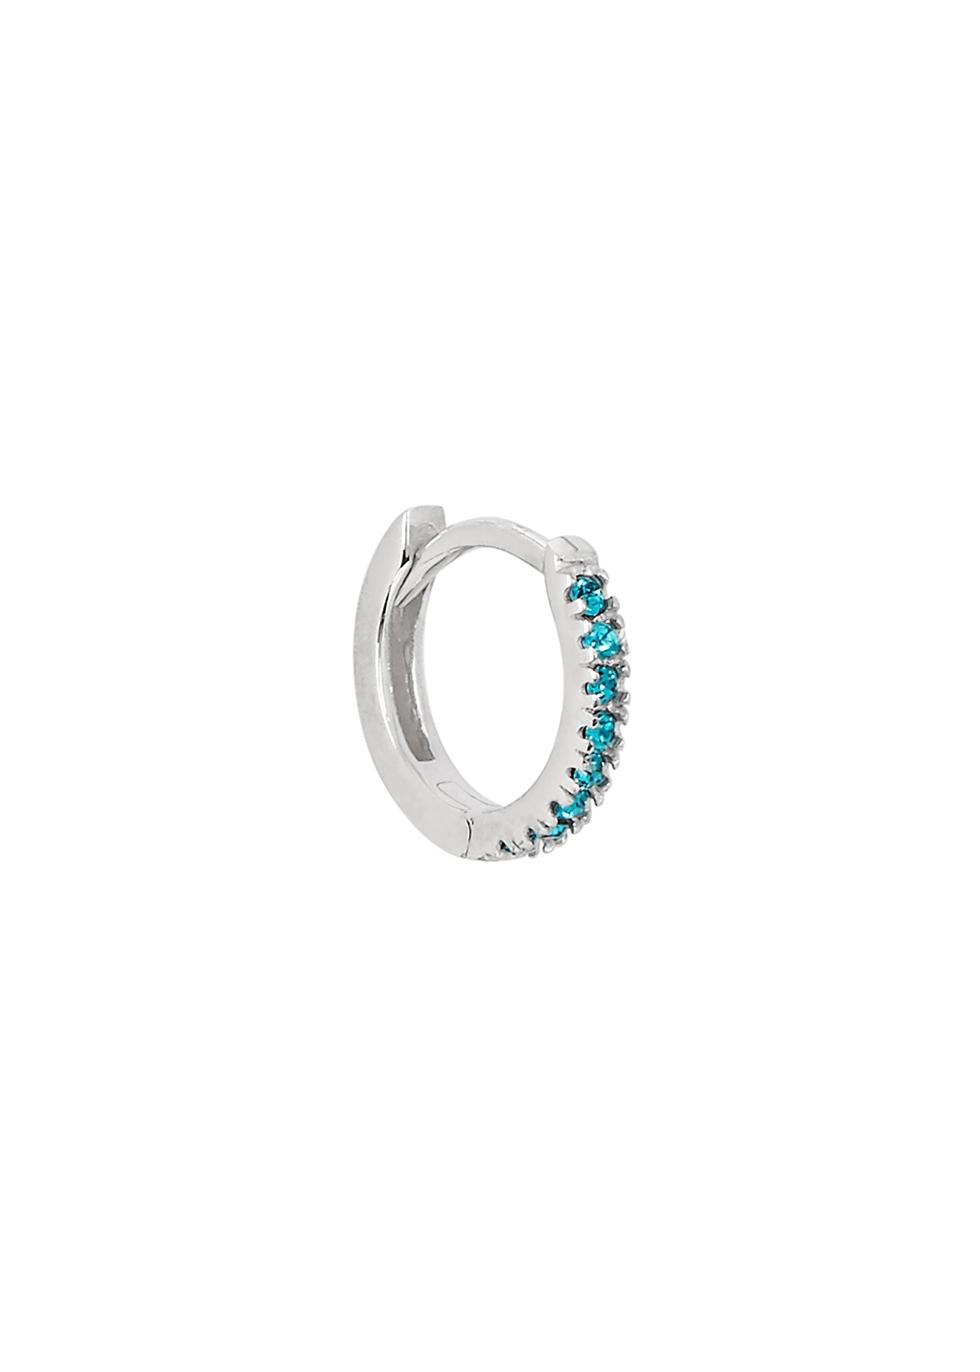 ROSIE FORTESCUE Sterling Silver Hoop Earring in Blue